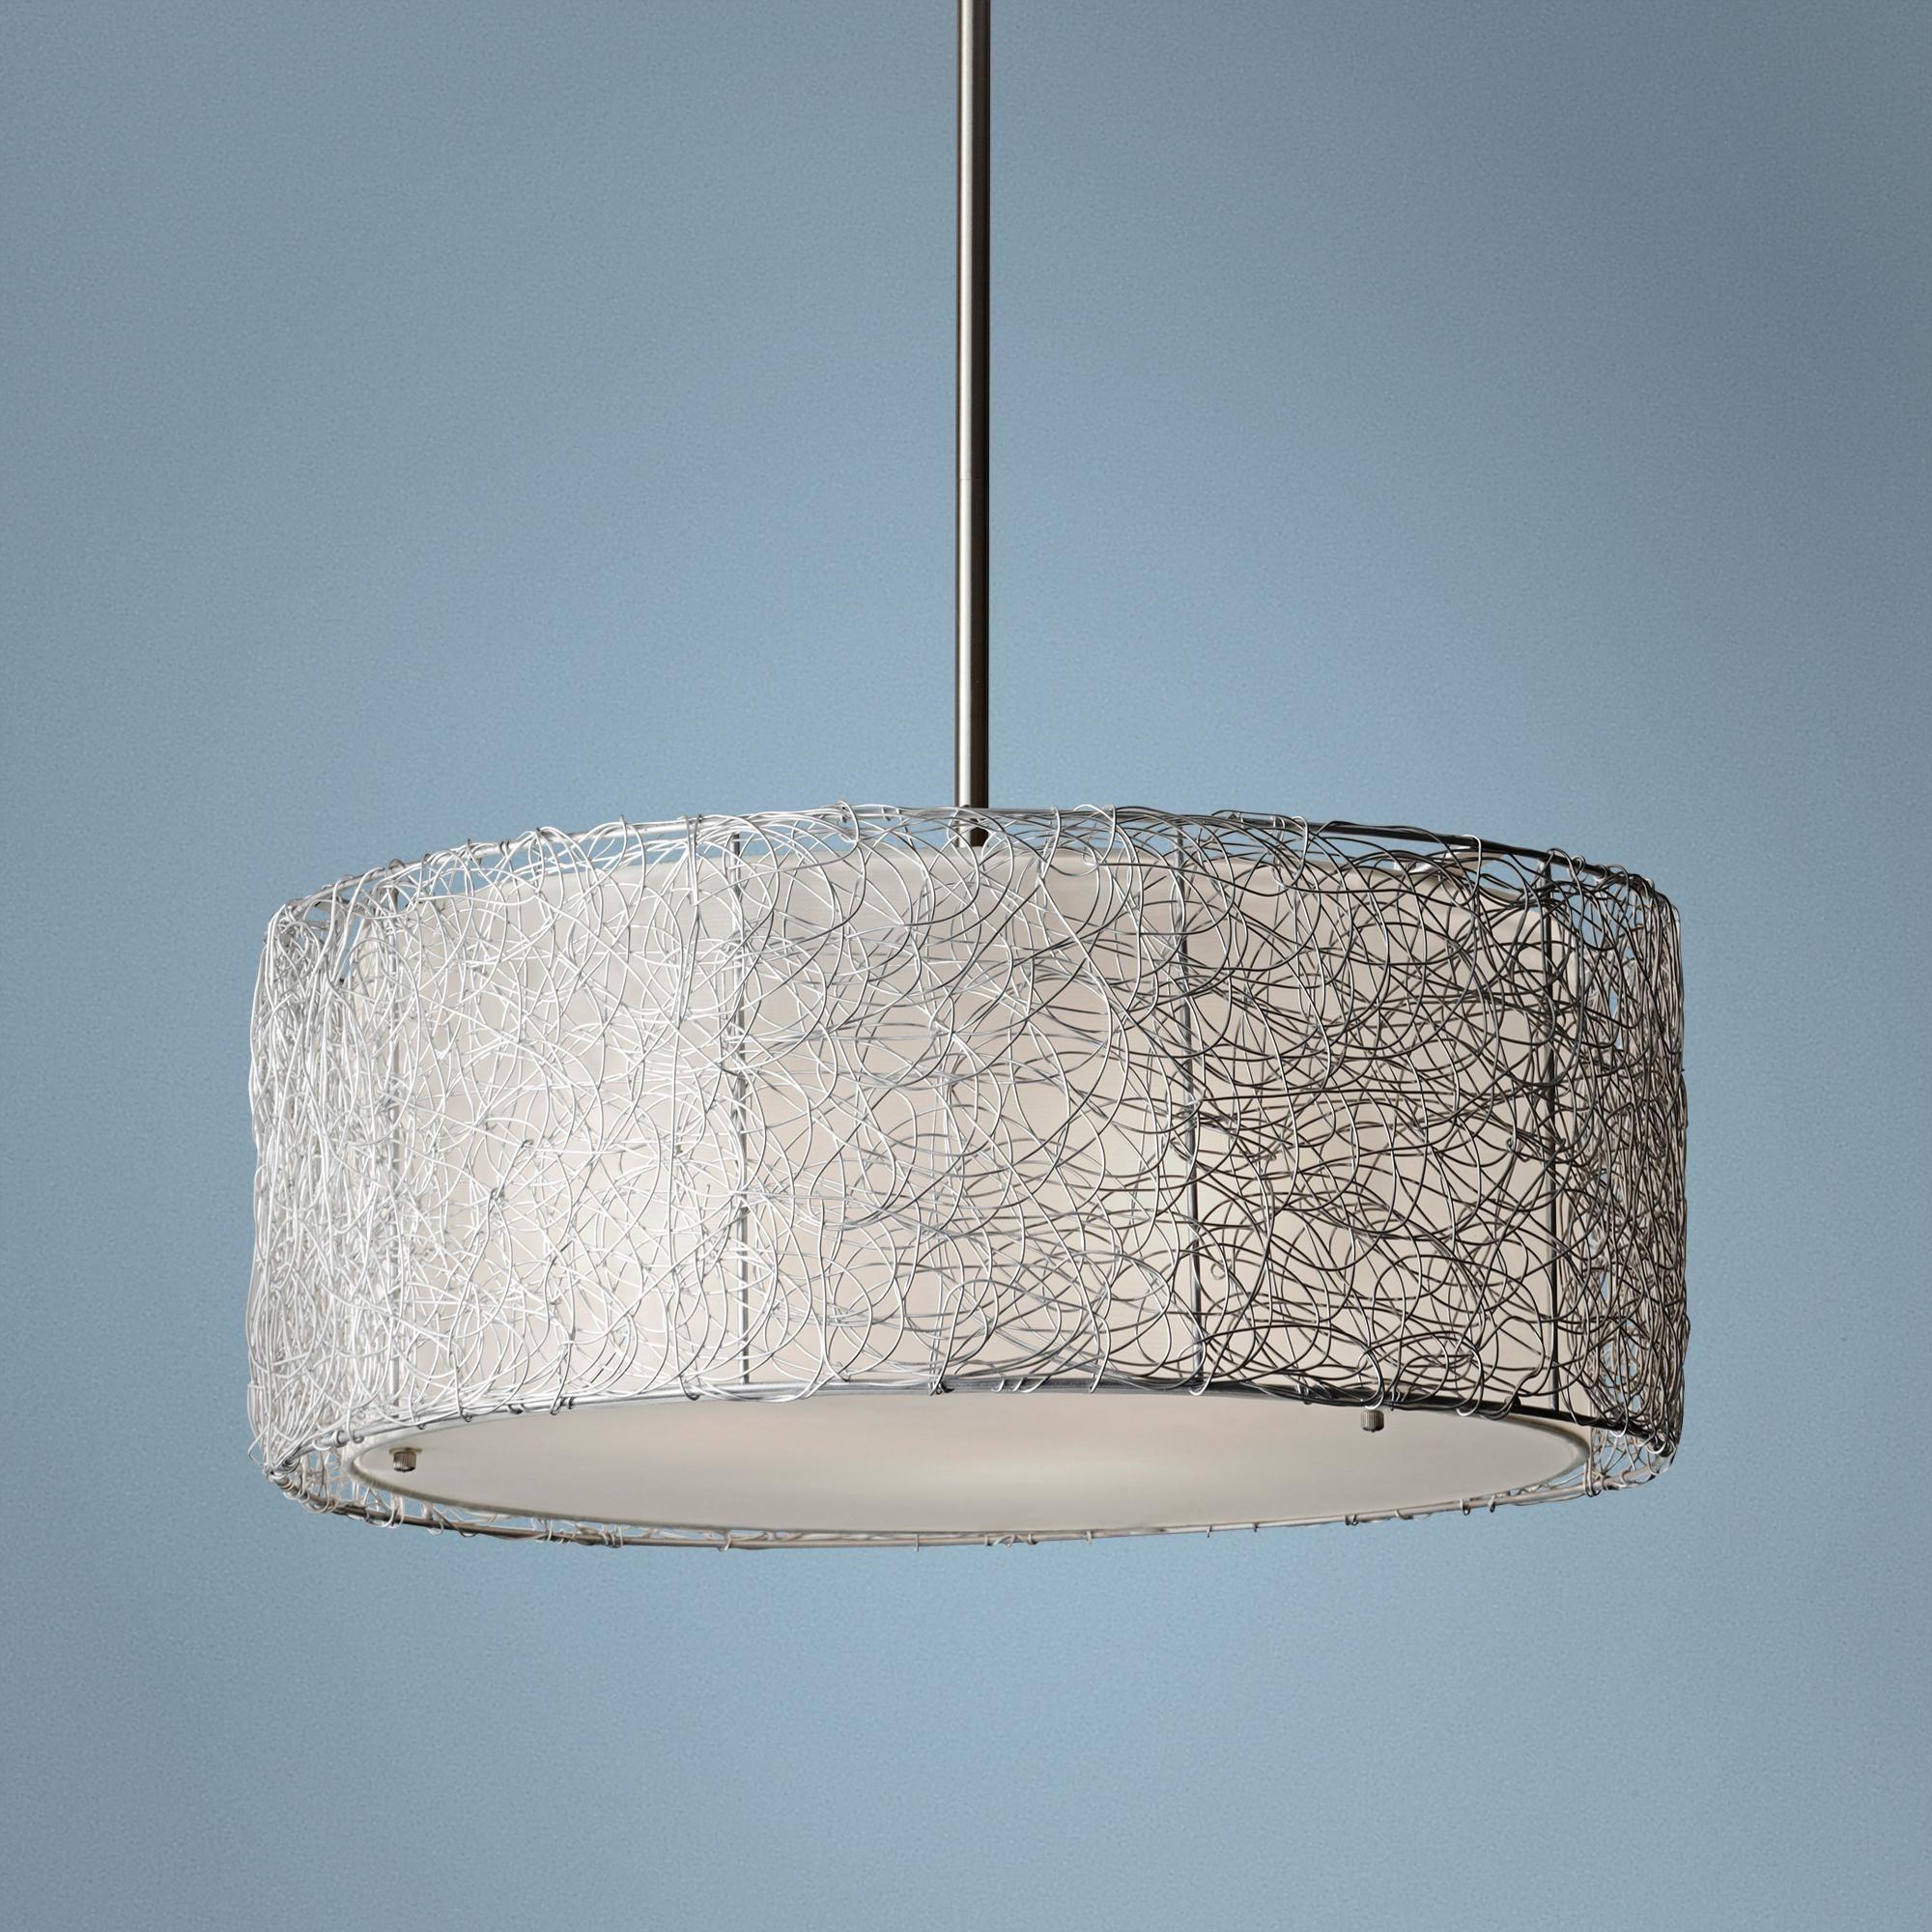 Feiss wired 19 34 wide brushed steel pendant light pendant murray feiss wired 19 34 wide brushed steel pendant light aloadofball Gallery